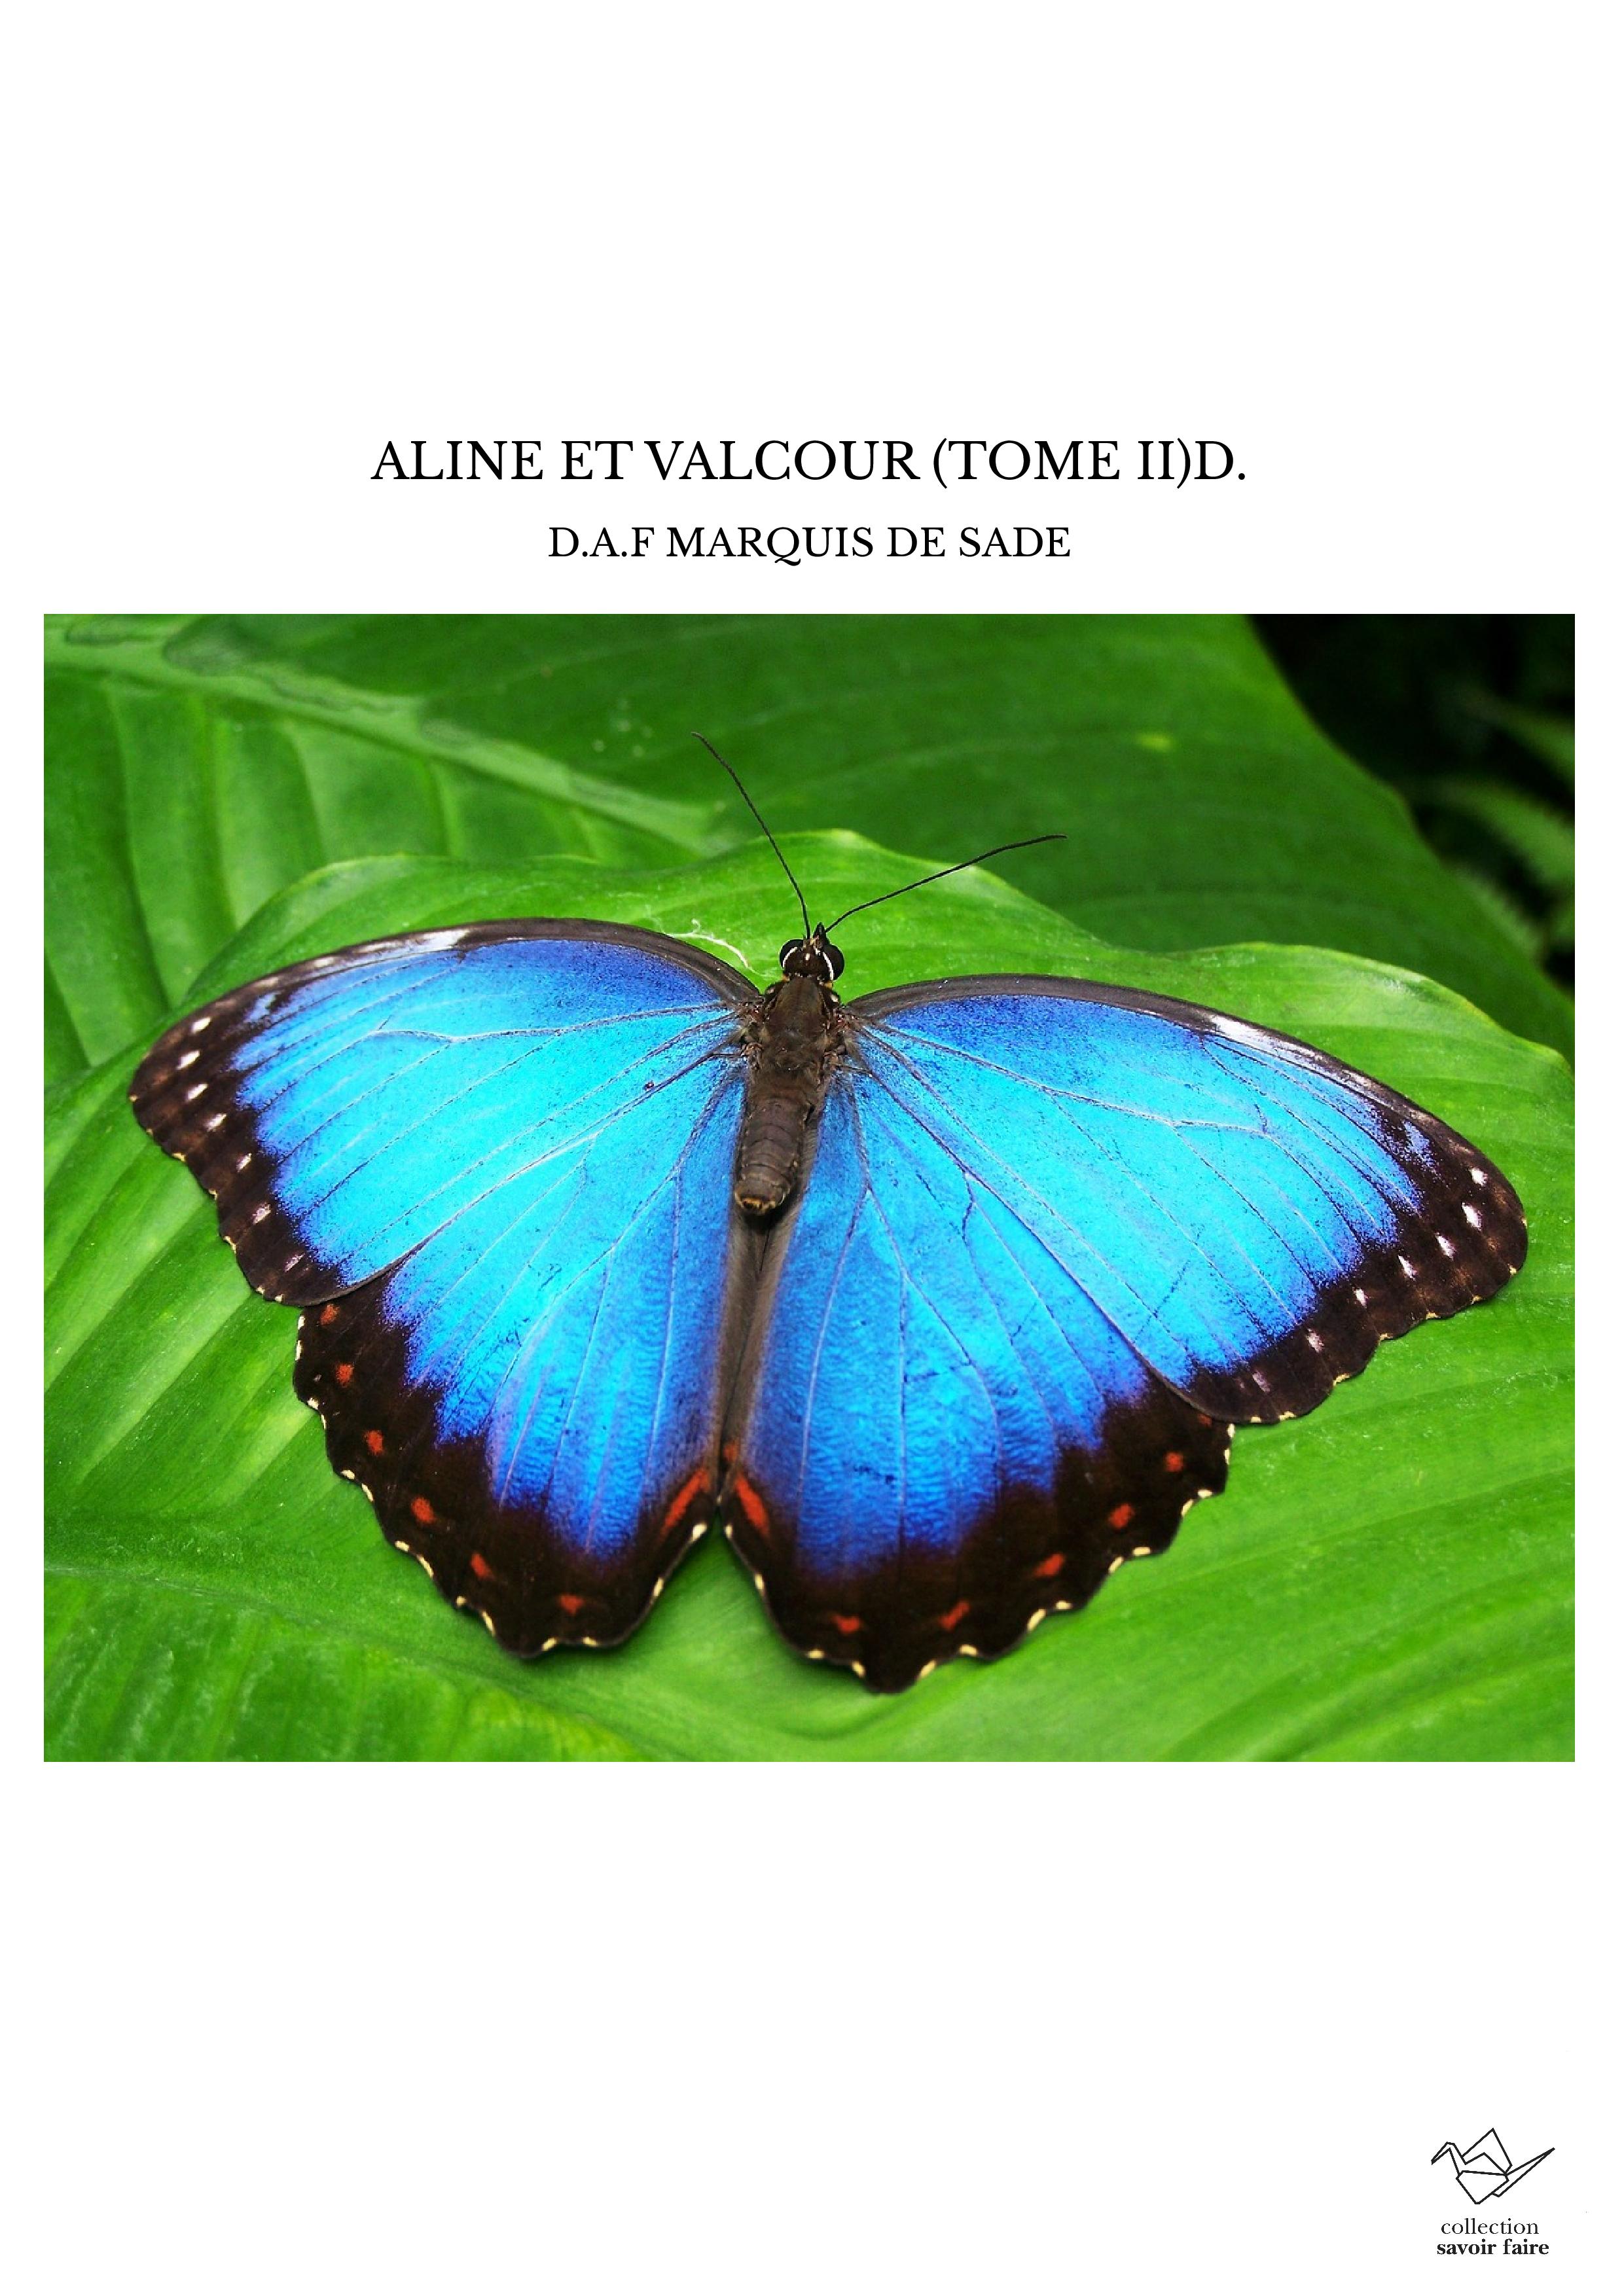 ALINE ET VALCOUR (TOME II)D.